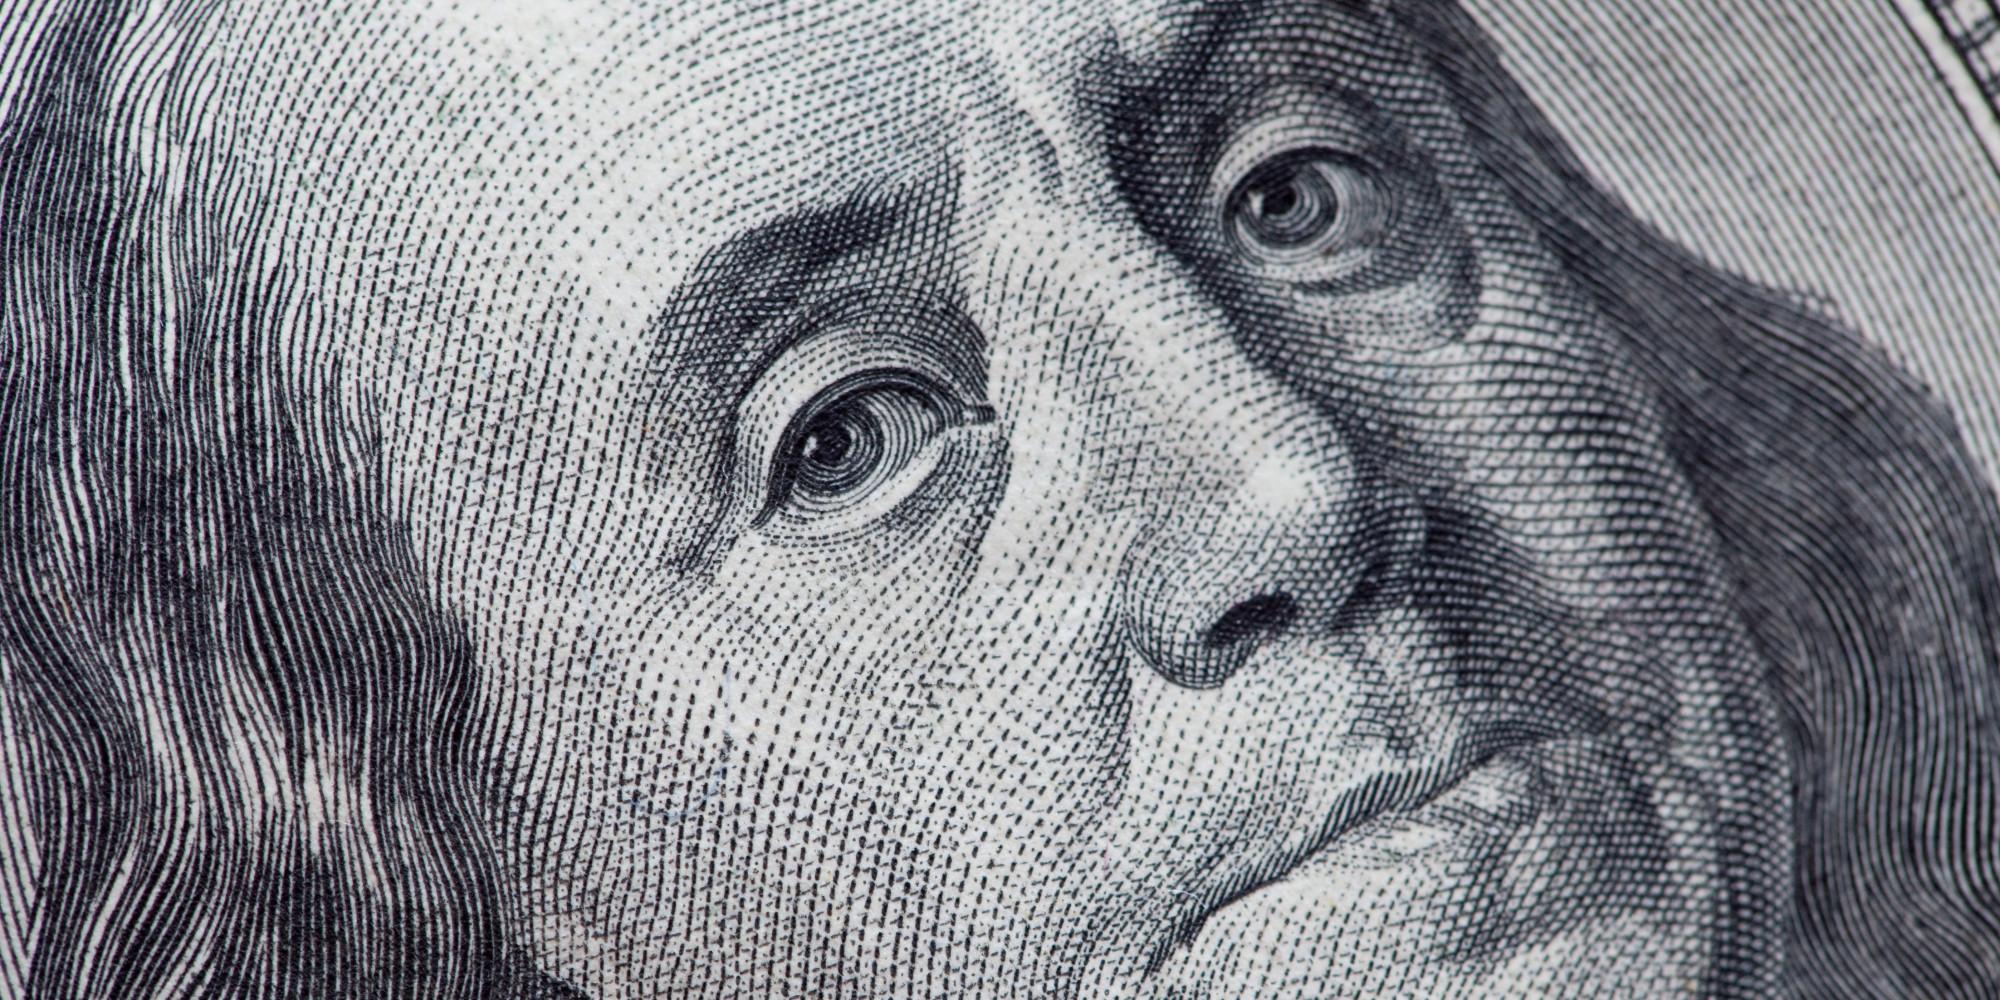 Closeup of Benjamin Frankin on US 00